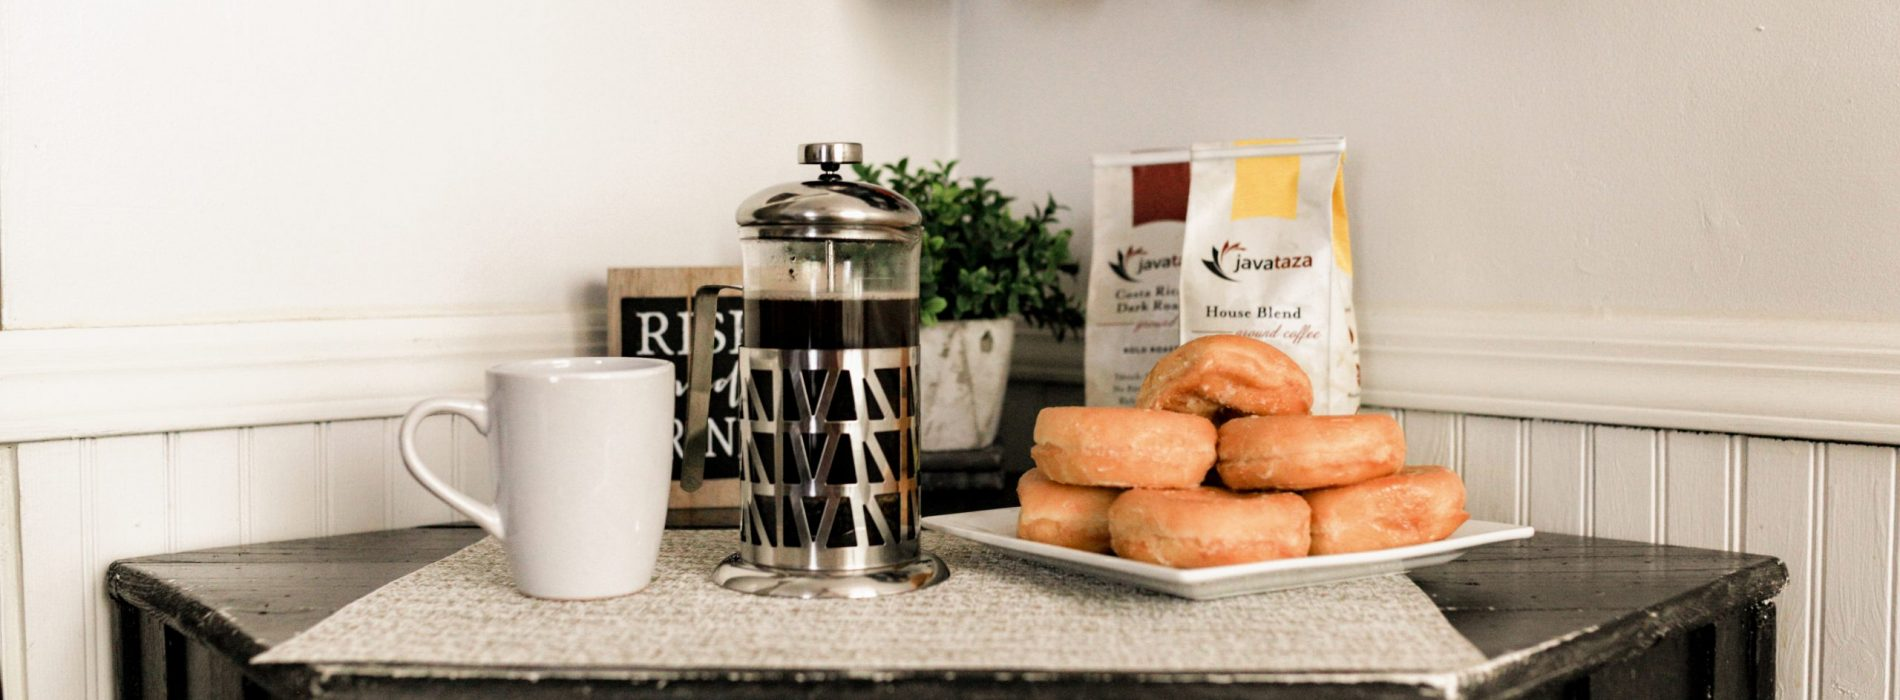 best coffee online javataza coffee company